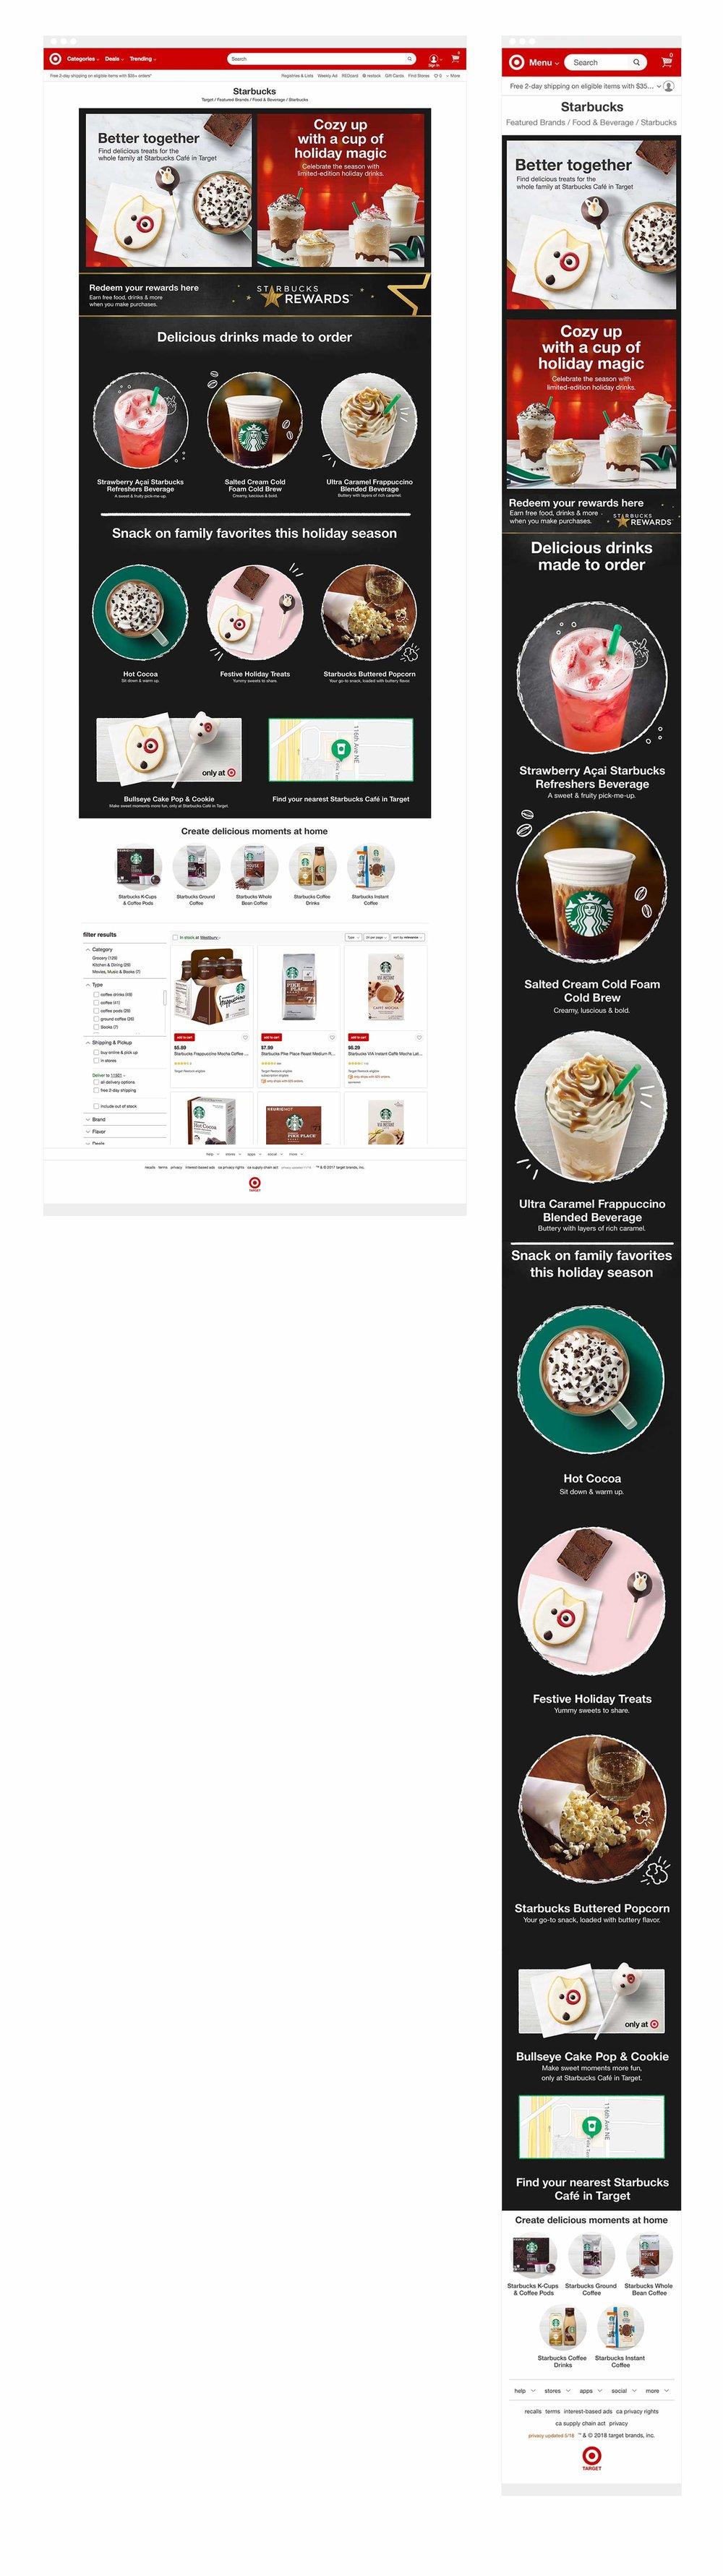 2018.Target.SBUX.BrandPage.1a.jpg